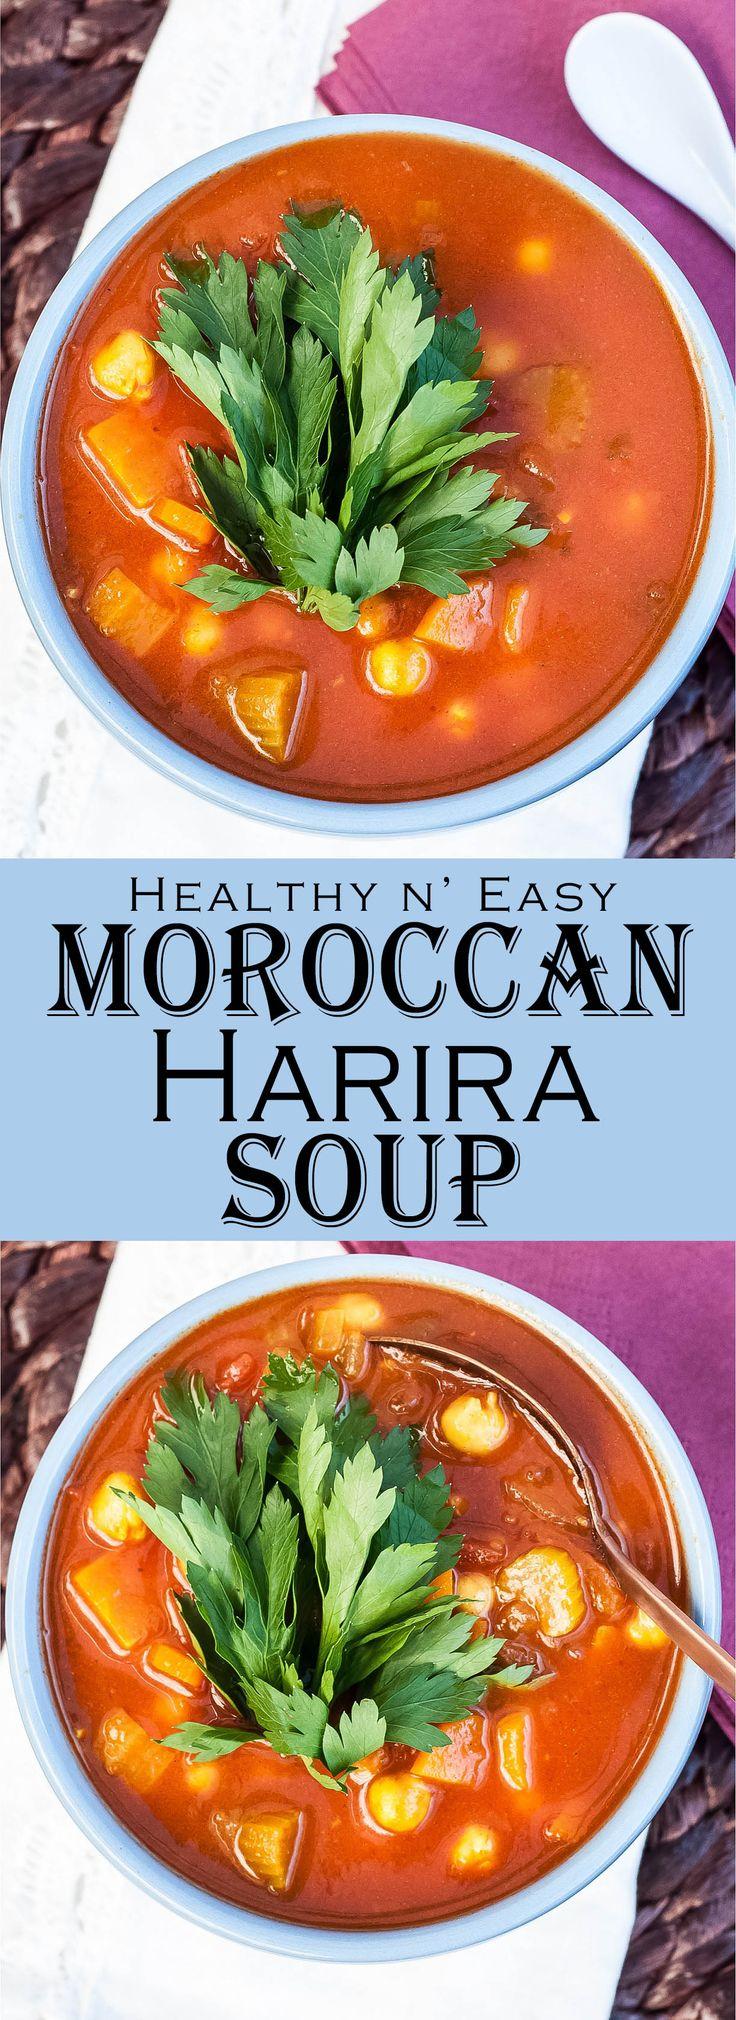 Healthy, easy to make, Vegan & GF Moroccan Harira Soup Recipe | VeganFamilyRecipes.com | #vegetarian #glutenfree #plantbased